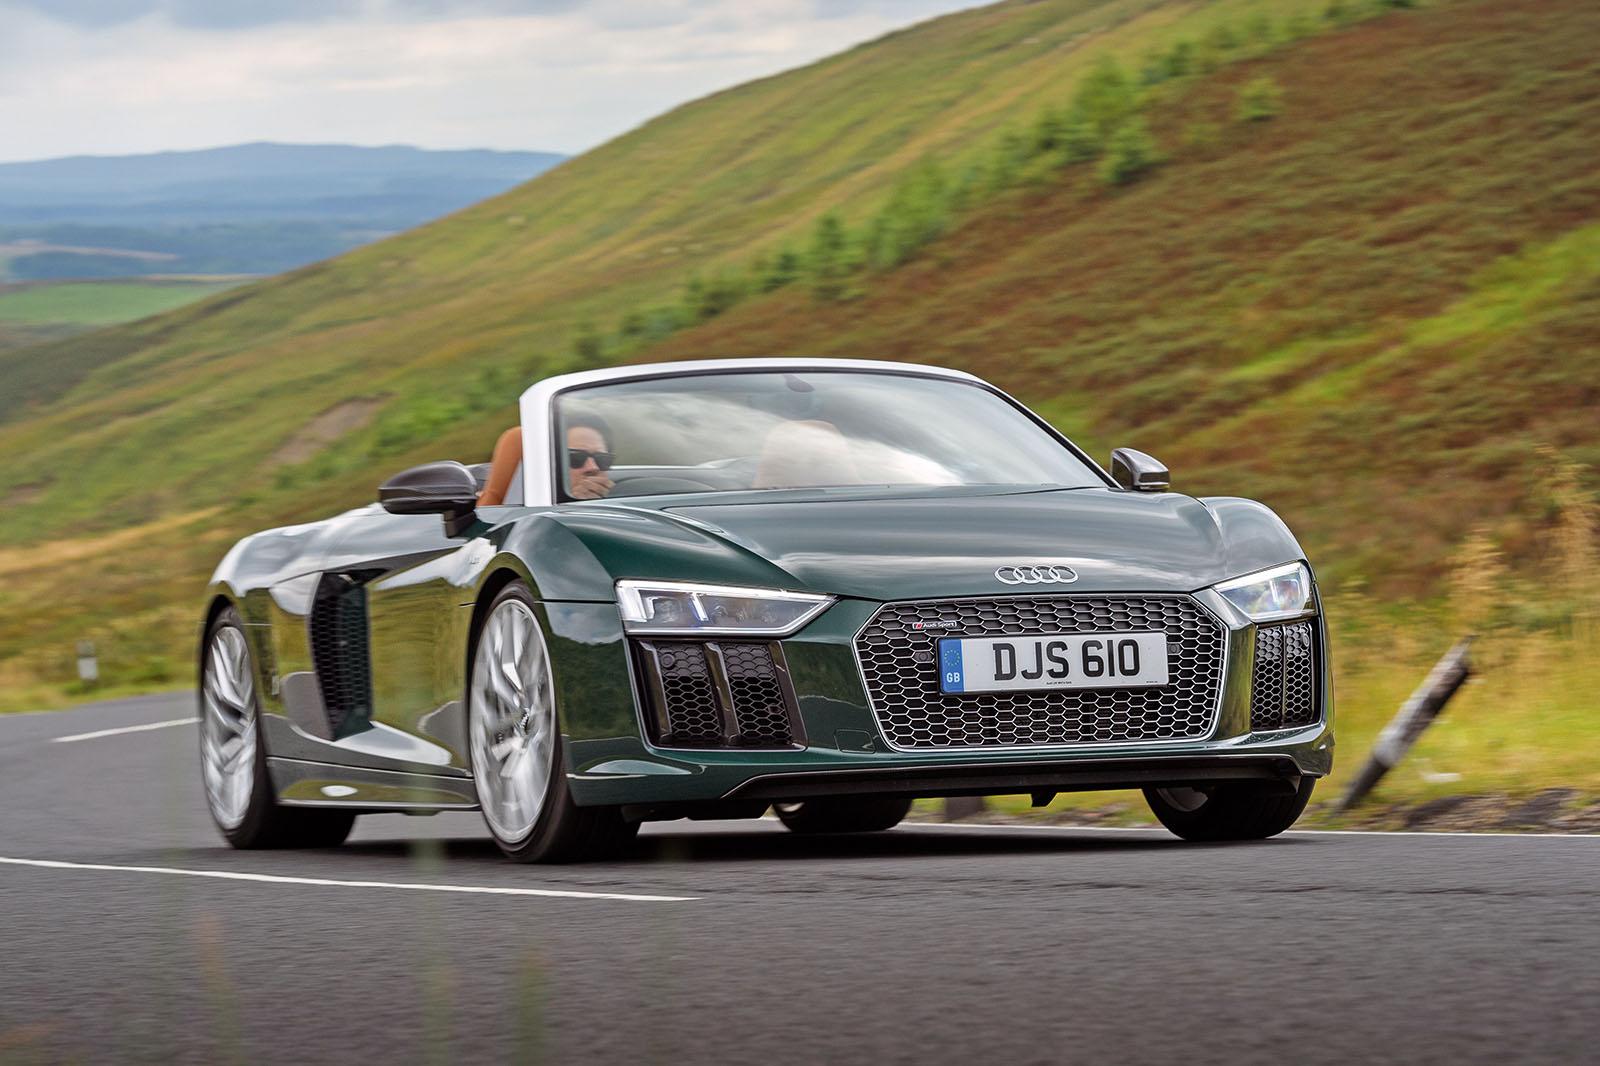 Audi audi r8 spyder v10 : Audi R8 Spyder V10 Plus 2017 review | Autocar